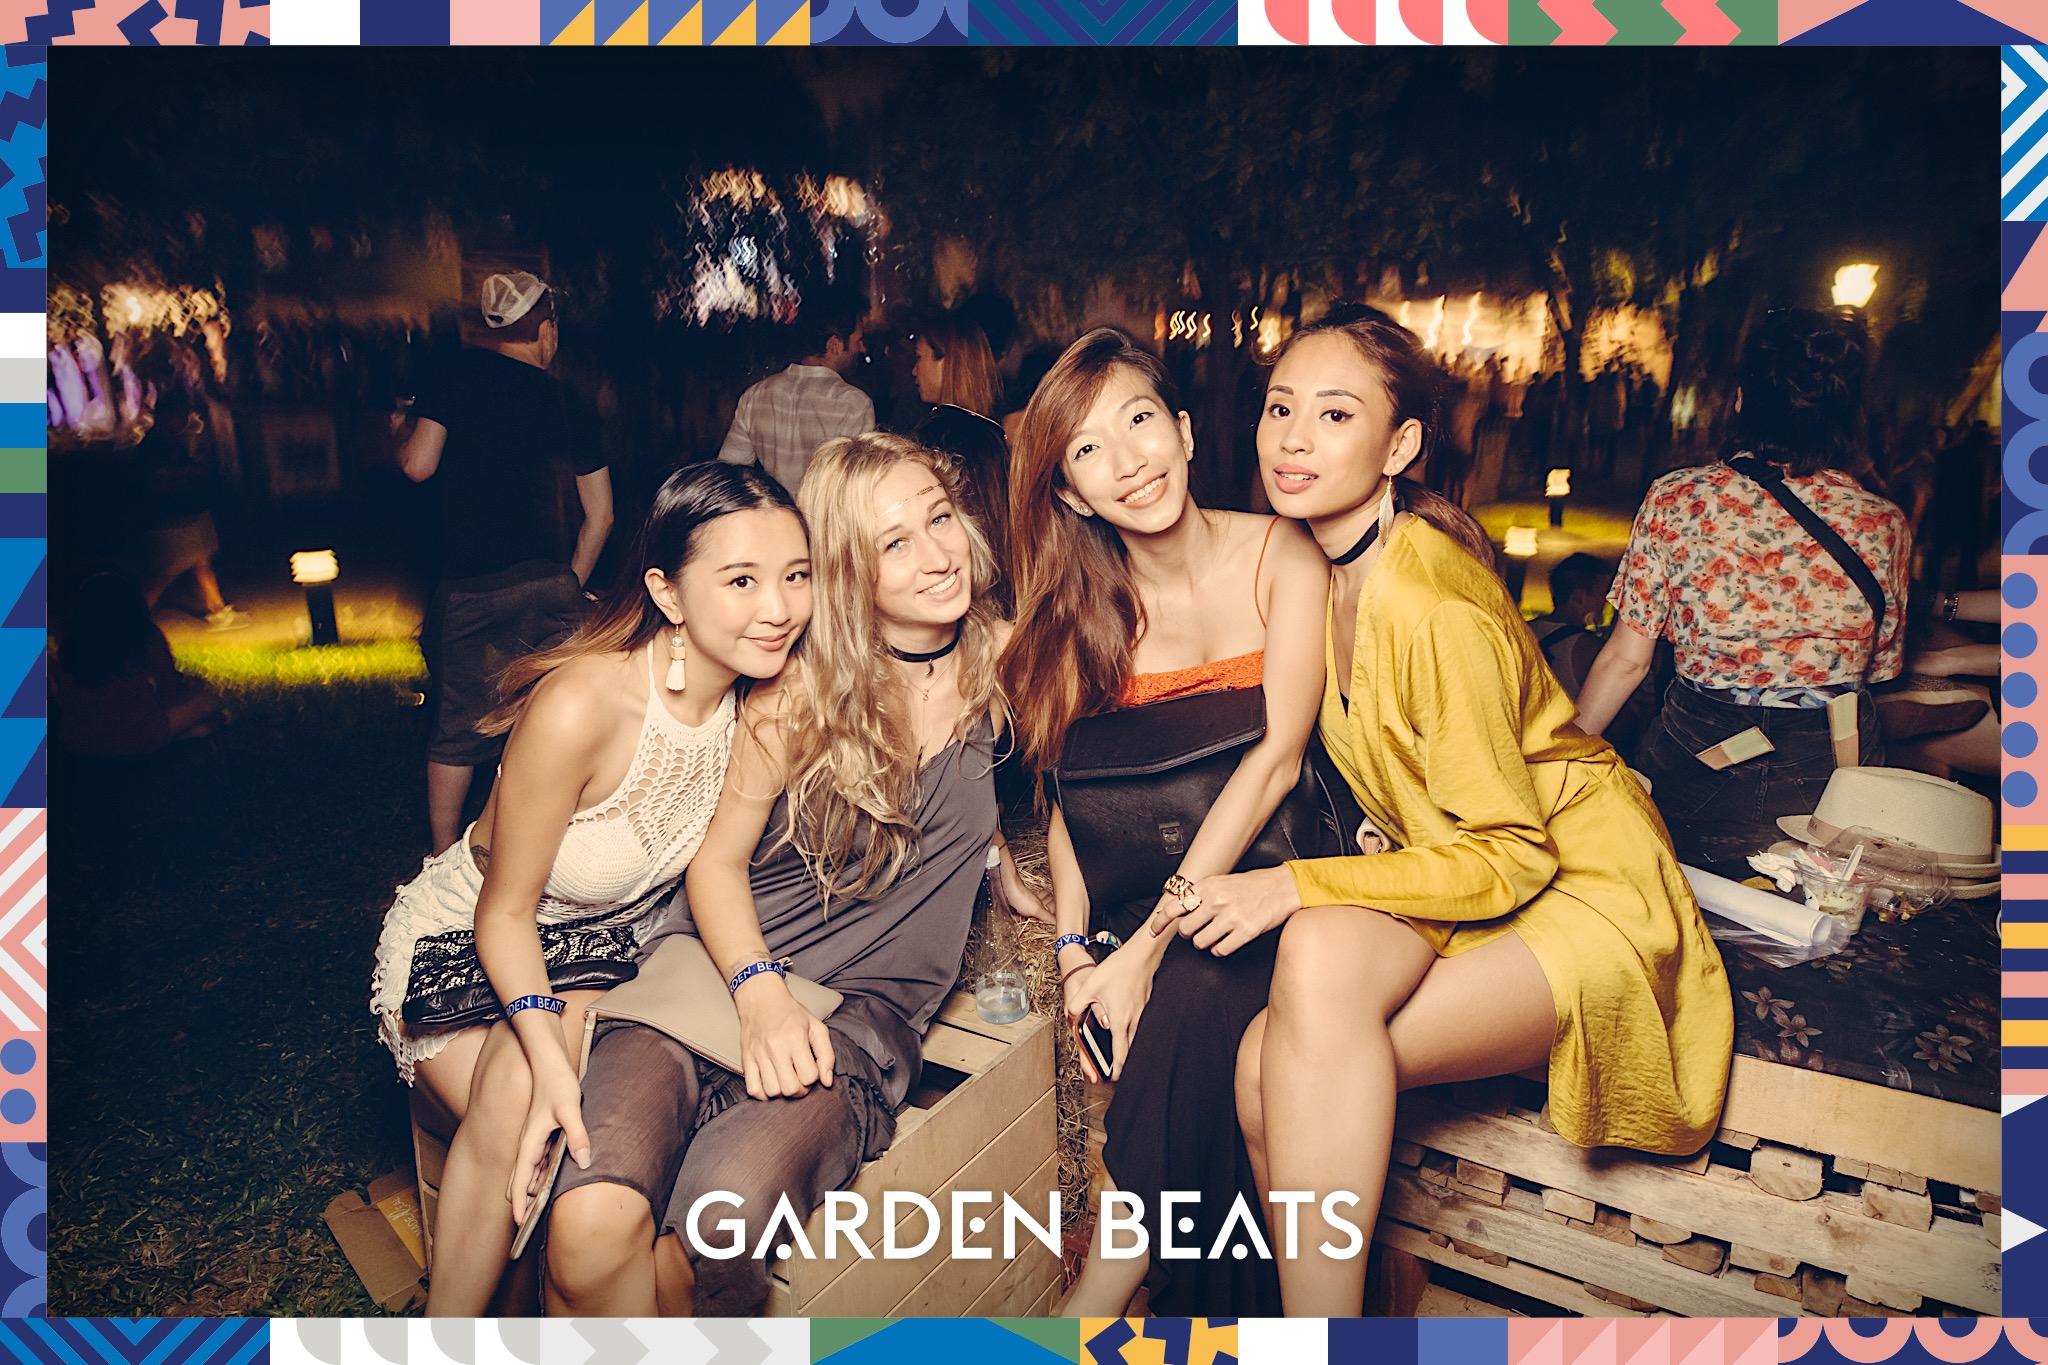 18032017_GardenBeats_Colossal847_WatermarkedGB.jpg